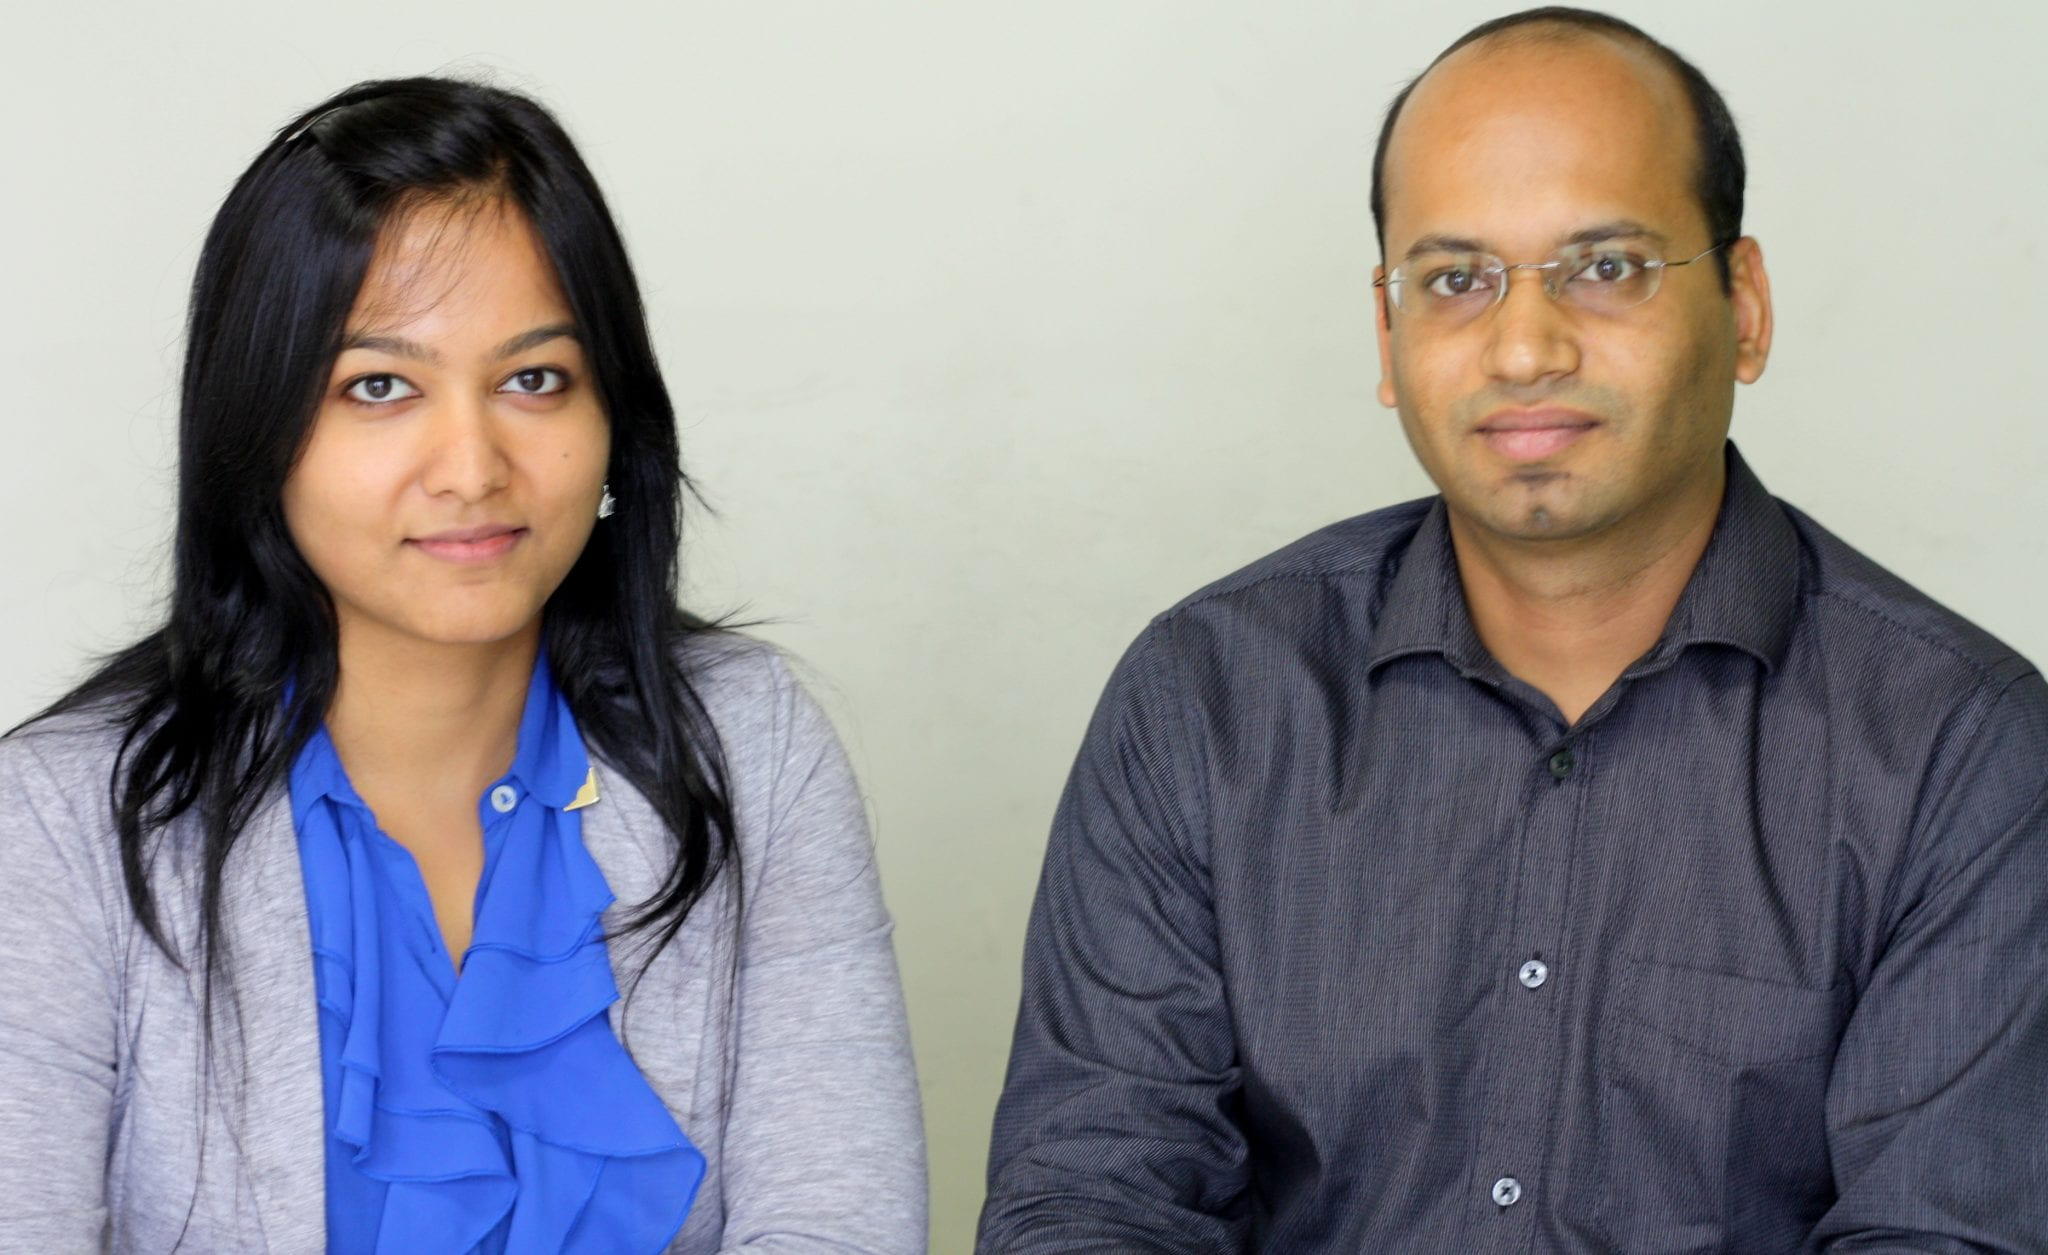 Tracxn founders